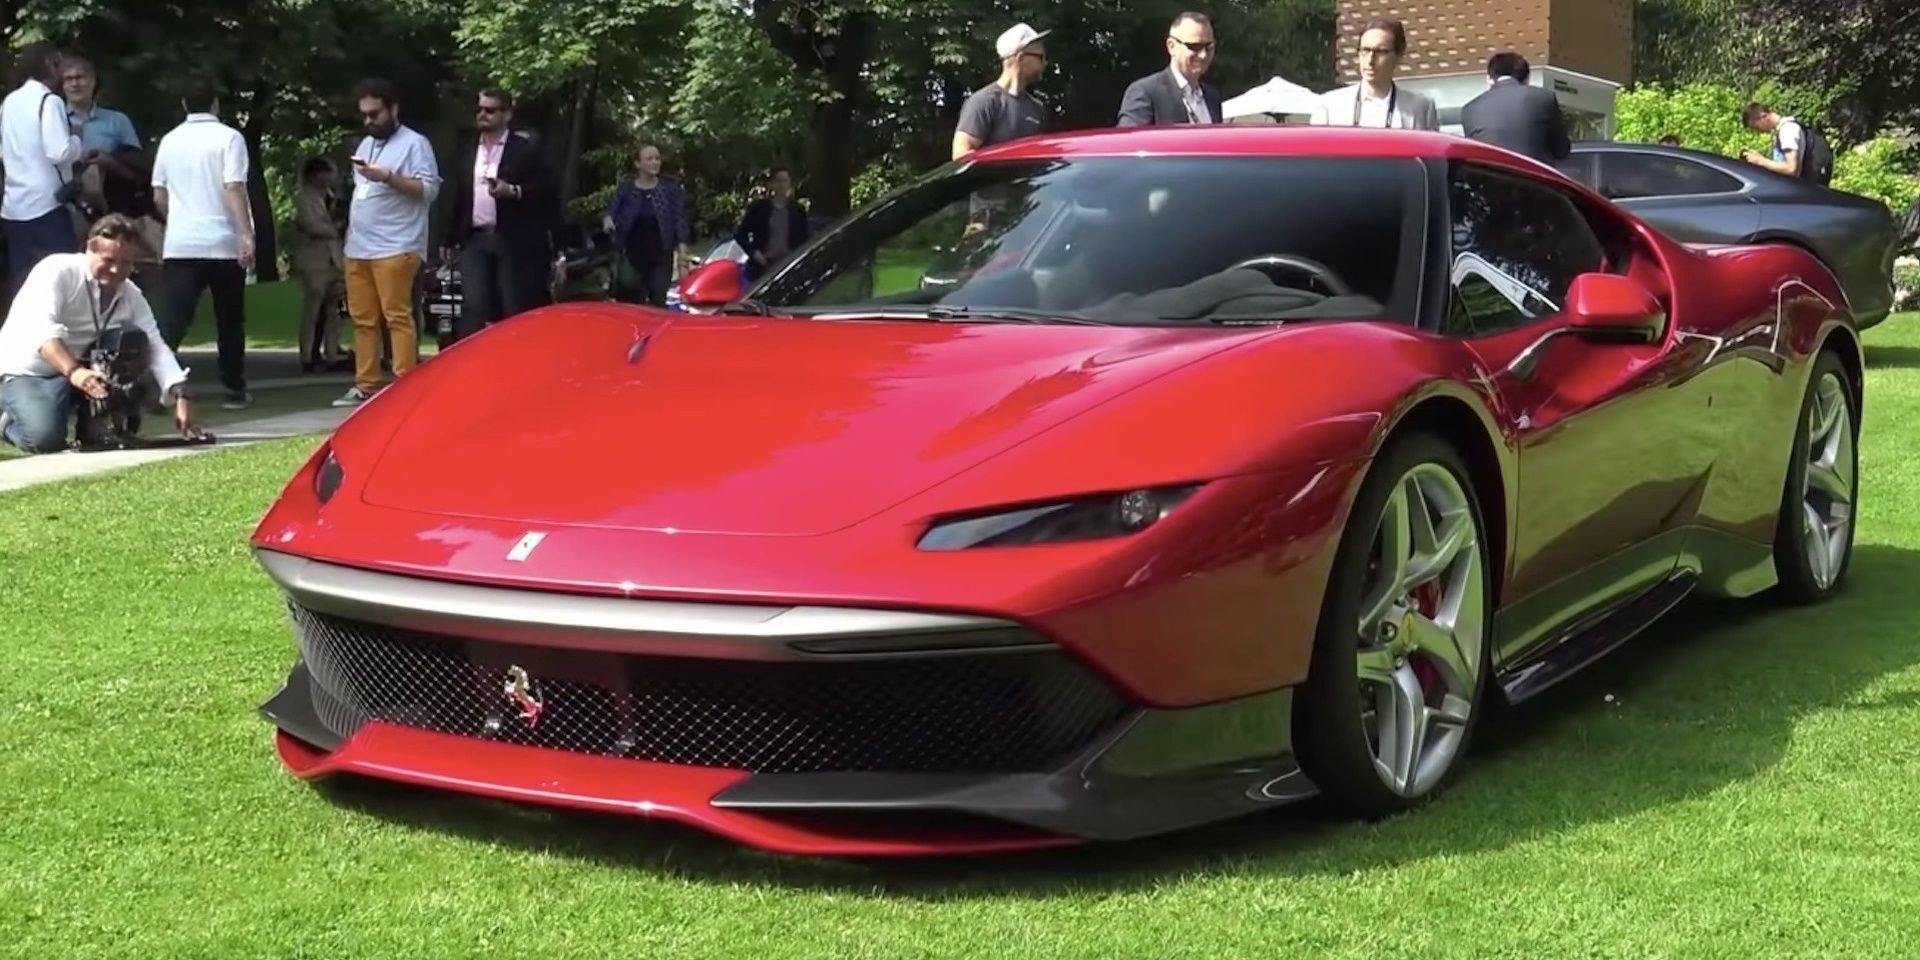 Ferrari's Coolest One-Off Sports Cars